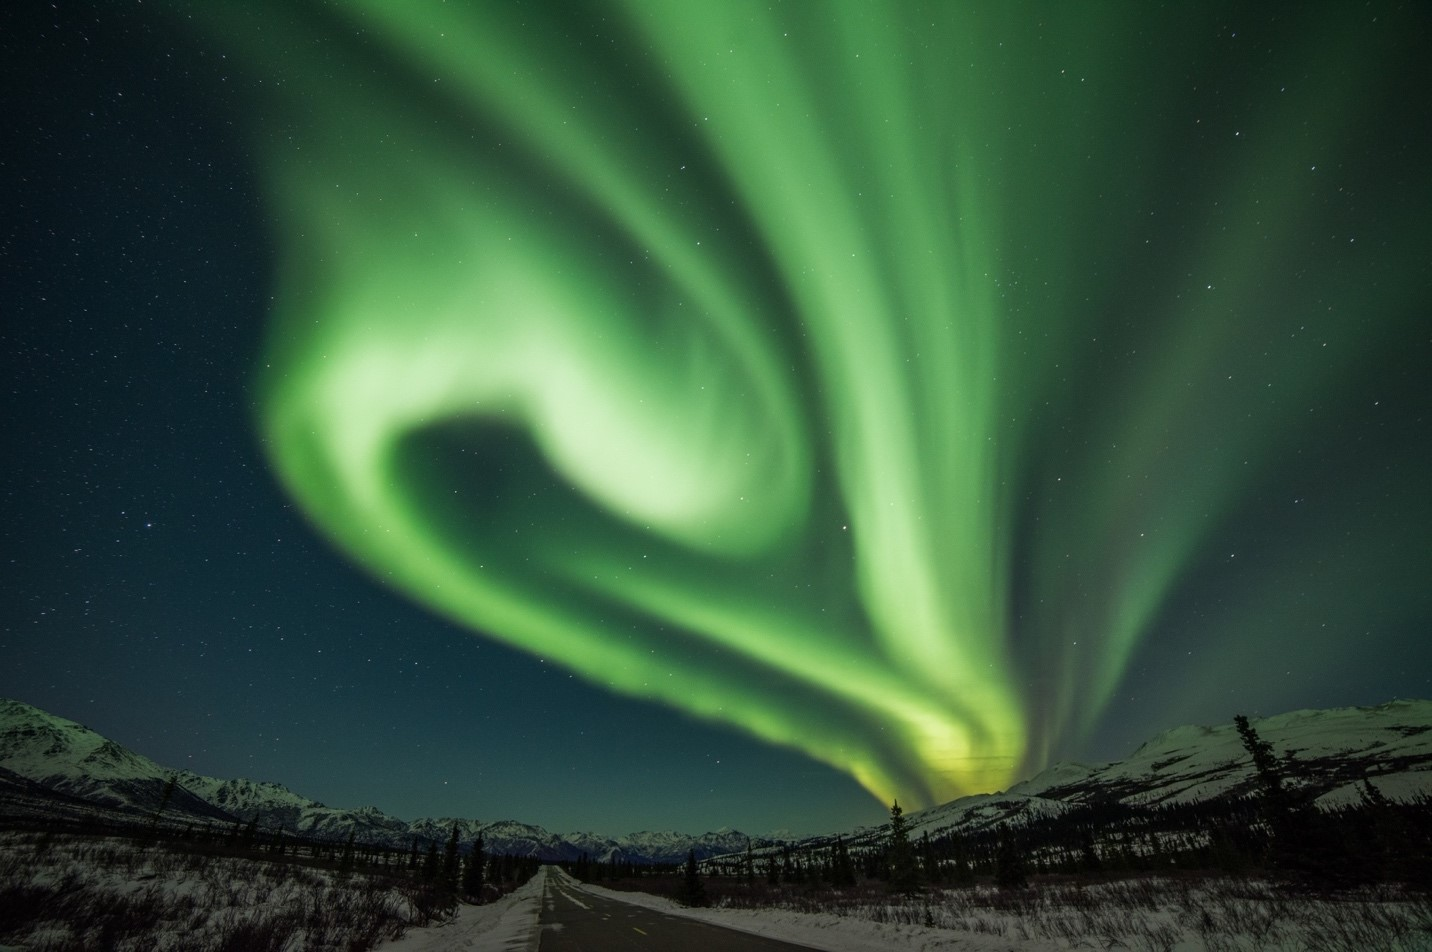 A photo of Aurora borealis in Alaska